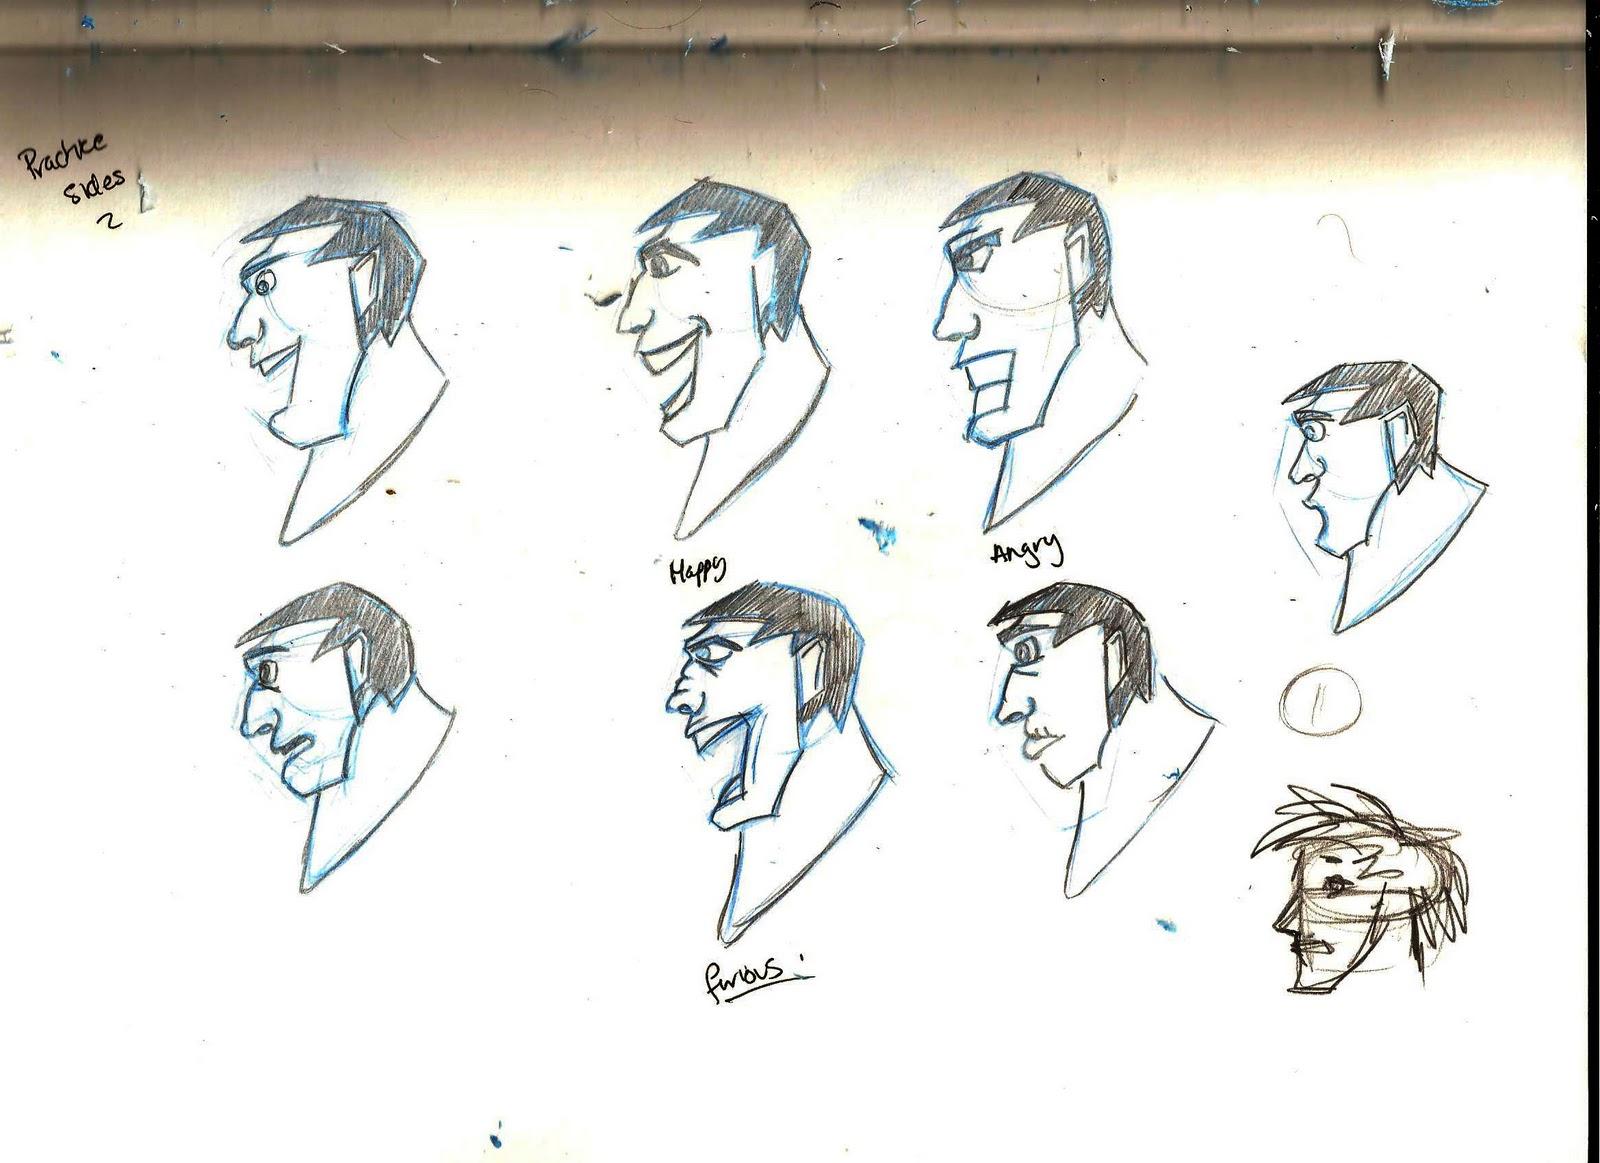 Character Design Page : Sharples designs character design hero skeleton work